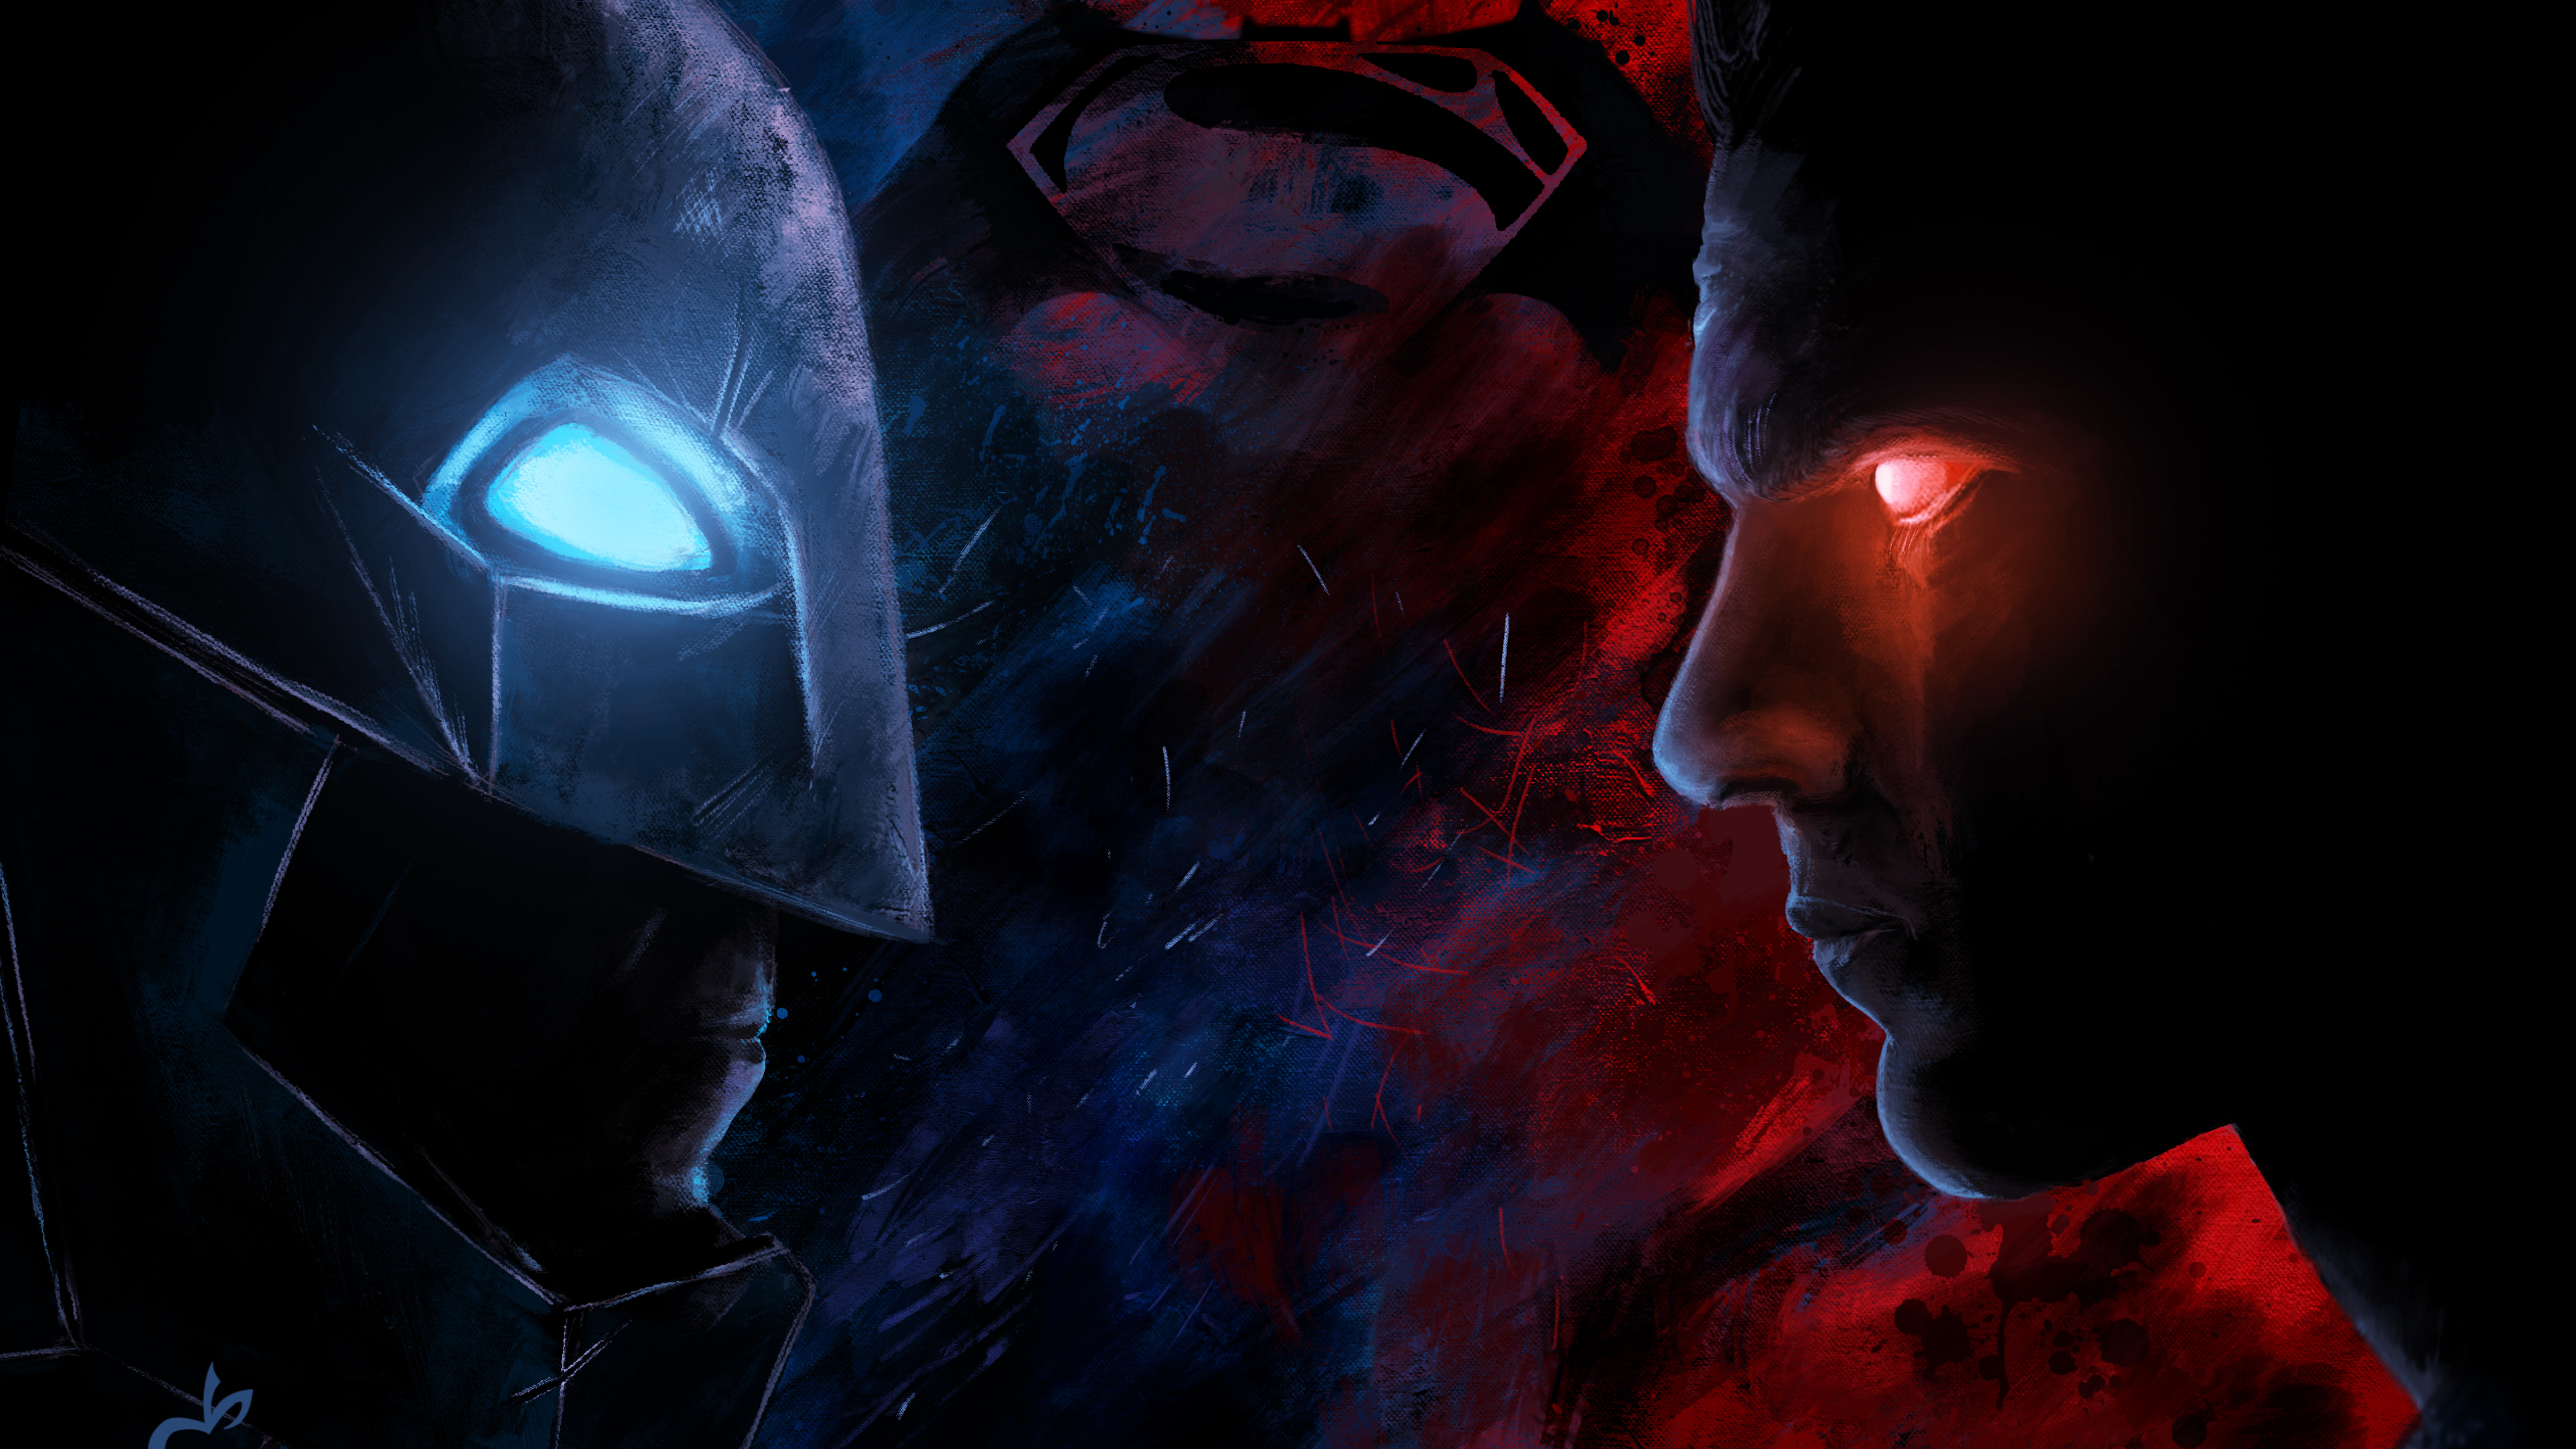 batman vs superman paint artwork 4k 1547506400 - Batman Vs Superman Paint Artwork 4k - superman wallpapers, superheroes wallpapers, hd-wallpapers, digital art wallpapers, batman wallpapers, artwork wallpapers, artist wallpapers, 5k wallpapers, 4k-wallpapers